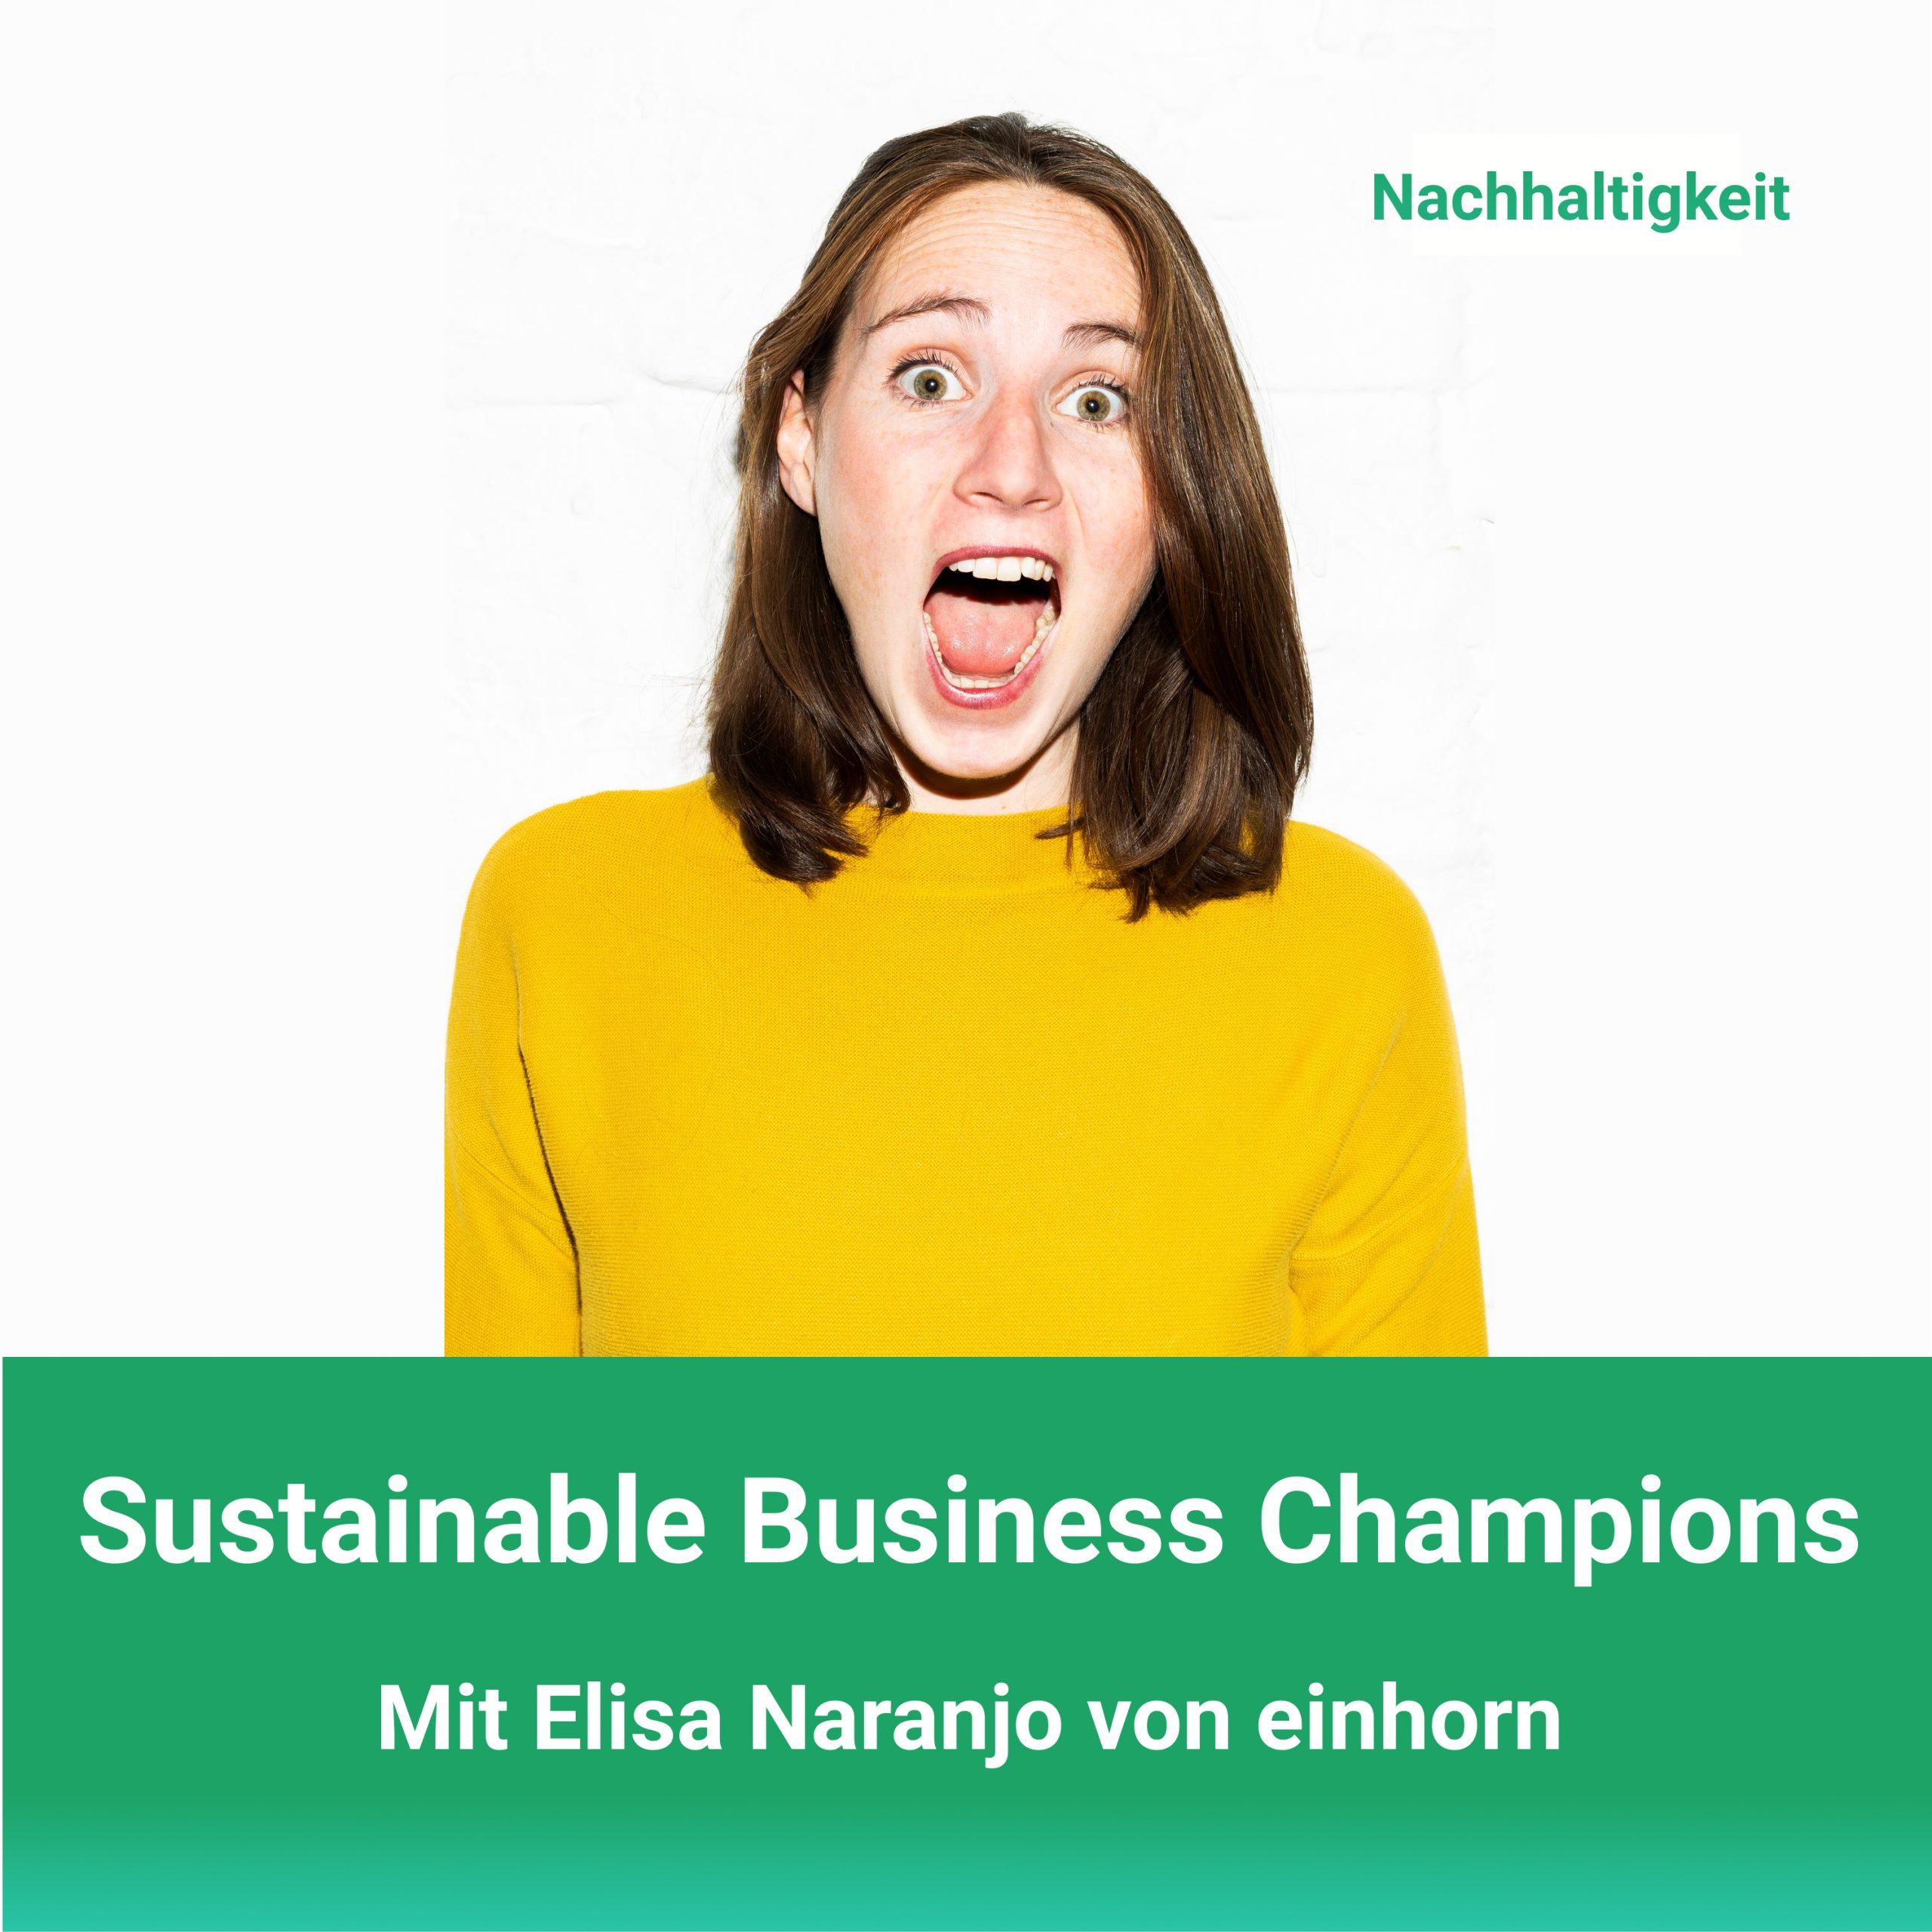 Podcast_Sustainable_Business_Champions_mit_Elisa_Naranjo_einhorn_products_GmbH